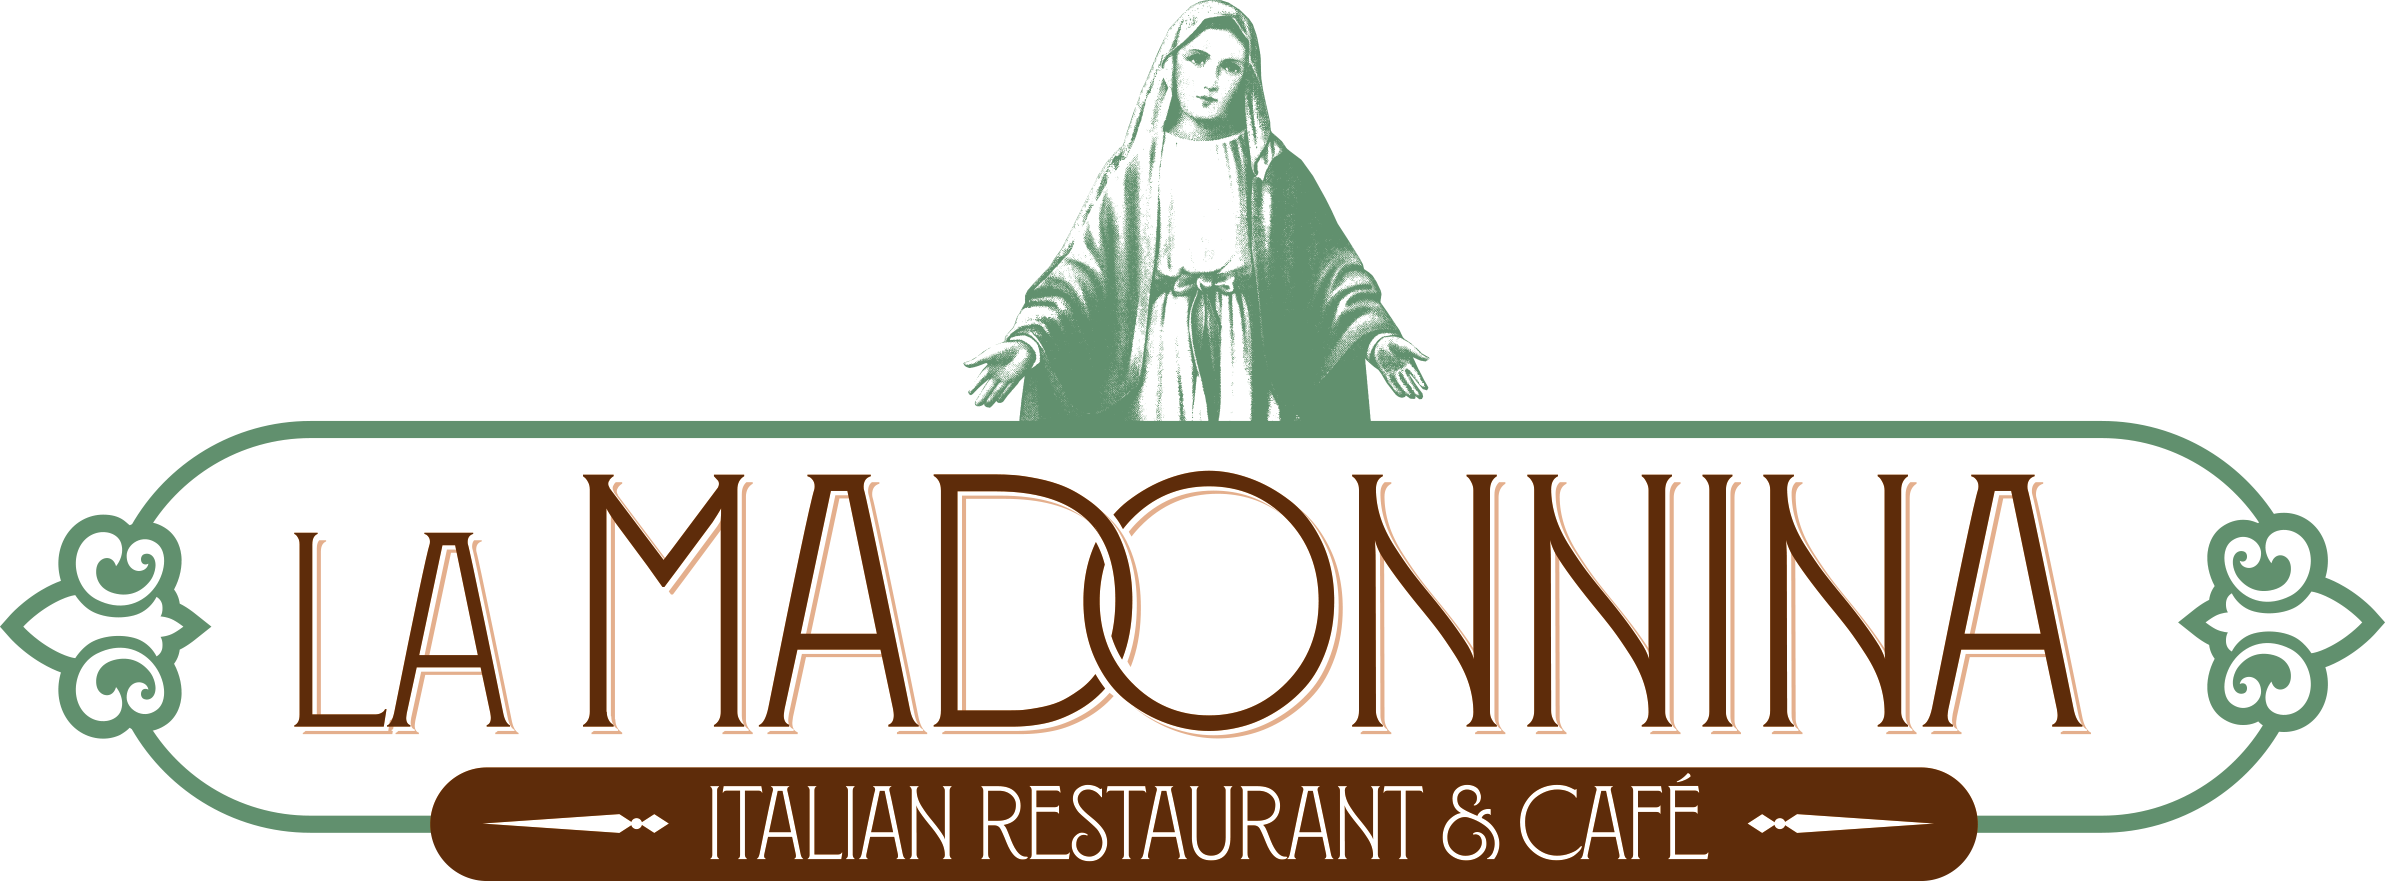 La Madonnina logo